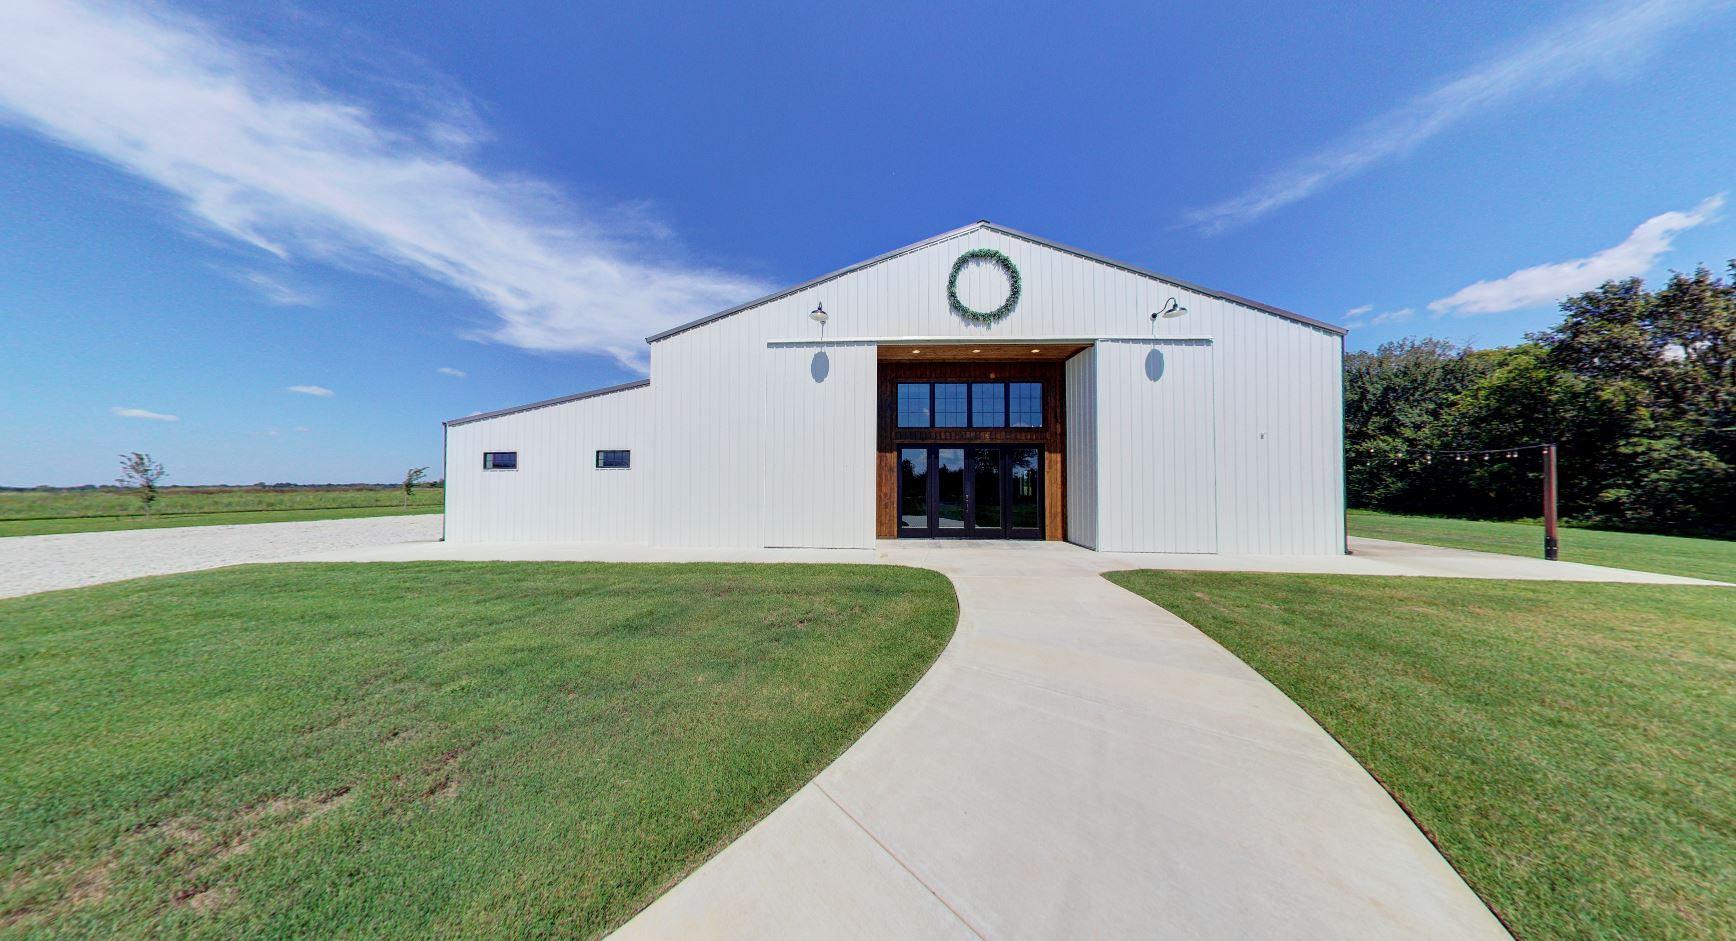 Greenleaf Barn Site Tour